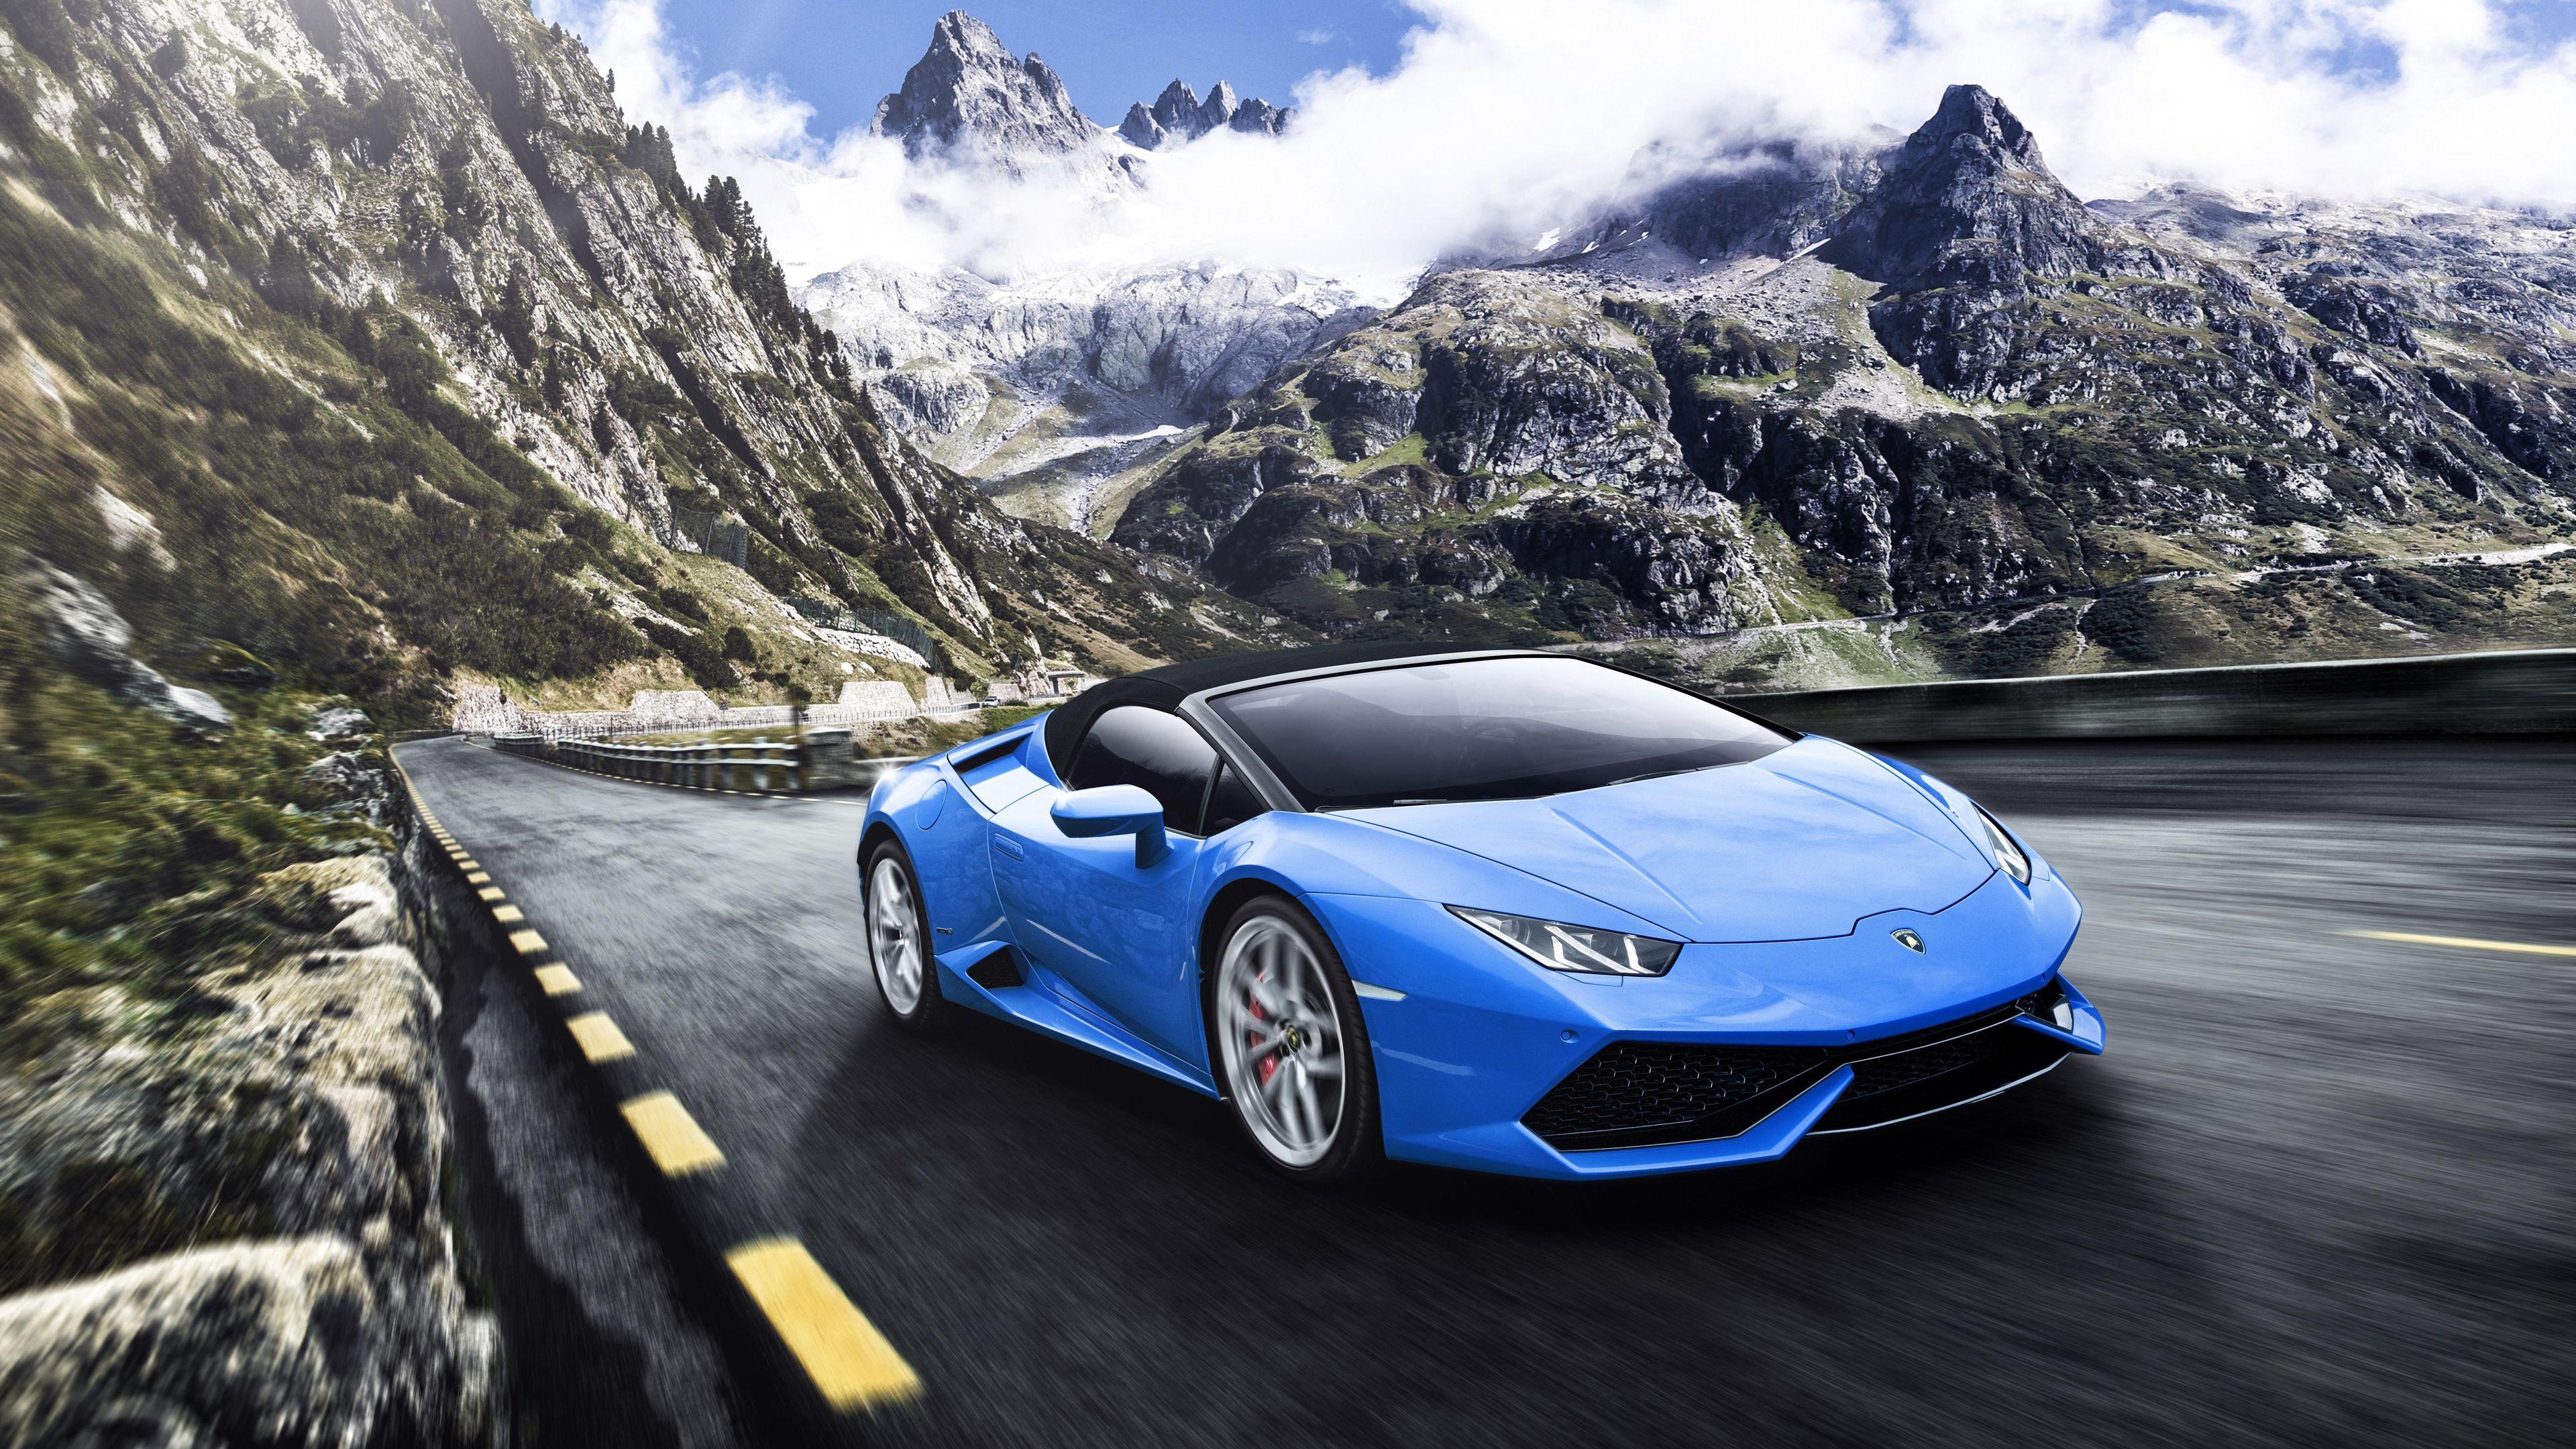 Blue Lamborghini Huracan 5k Wallpaper Https Hdwallpapersmafia Com Blue Lamborghini Huracan 5 Blue Lamborghini Lamborghini Huracan Lamborghini Huracan Spyder